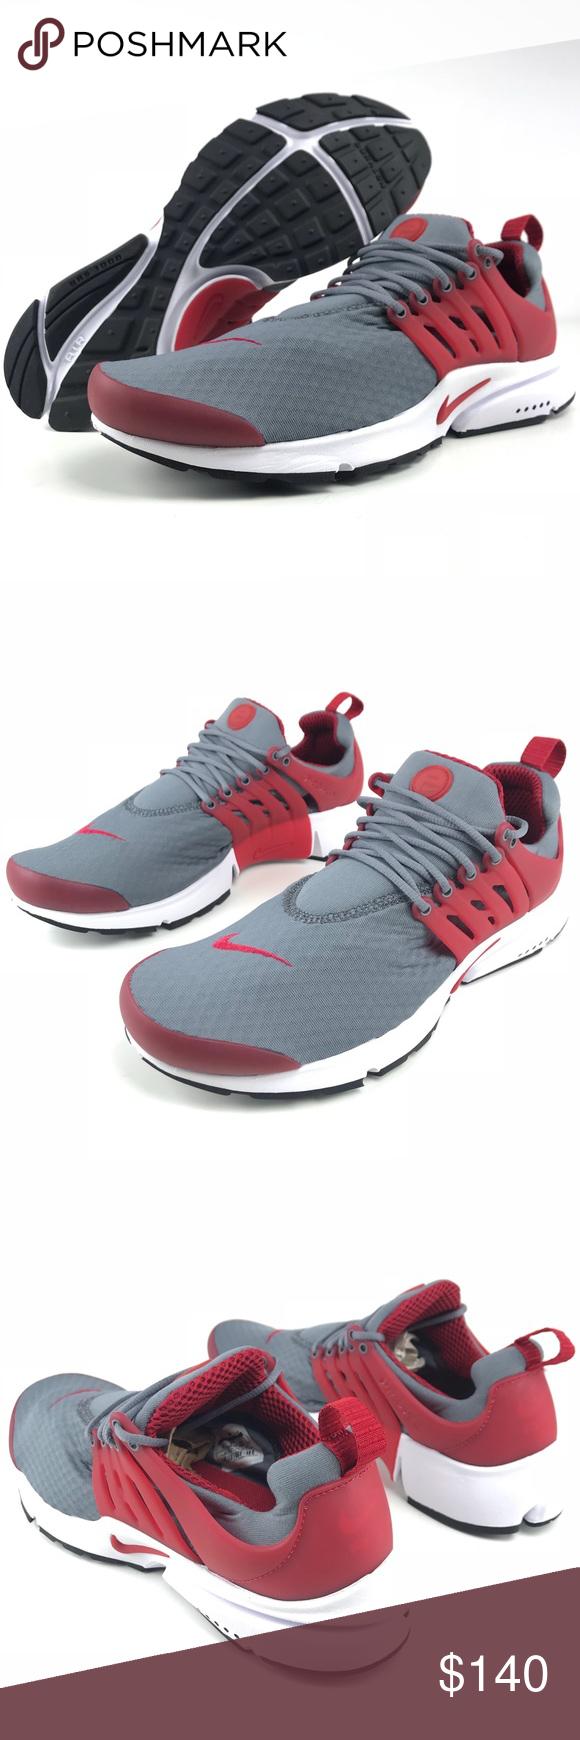 c654634f15 Nike Air Presto Essential Nike Air Presto Essential Color: Cool Grey/Gym Red-White  Black Style: 848187-008 No Original Box will be provided Nike Shoes ...